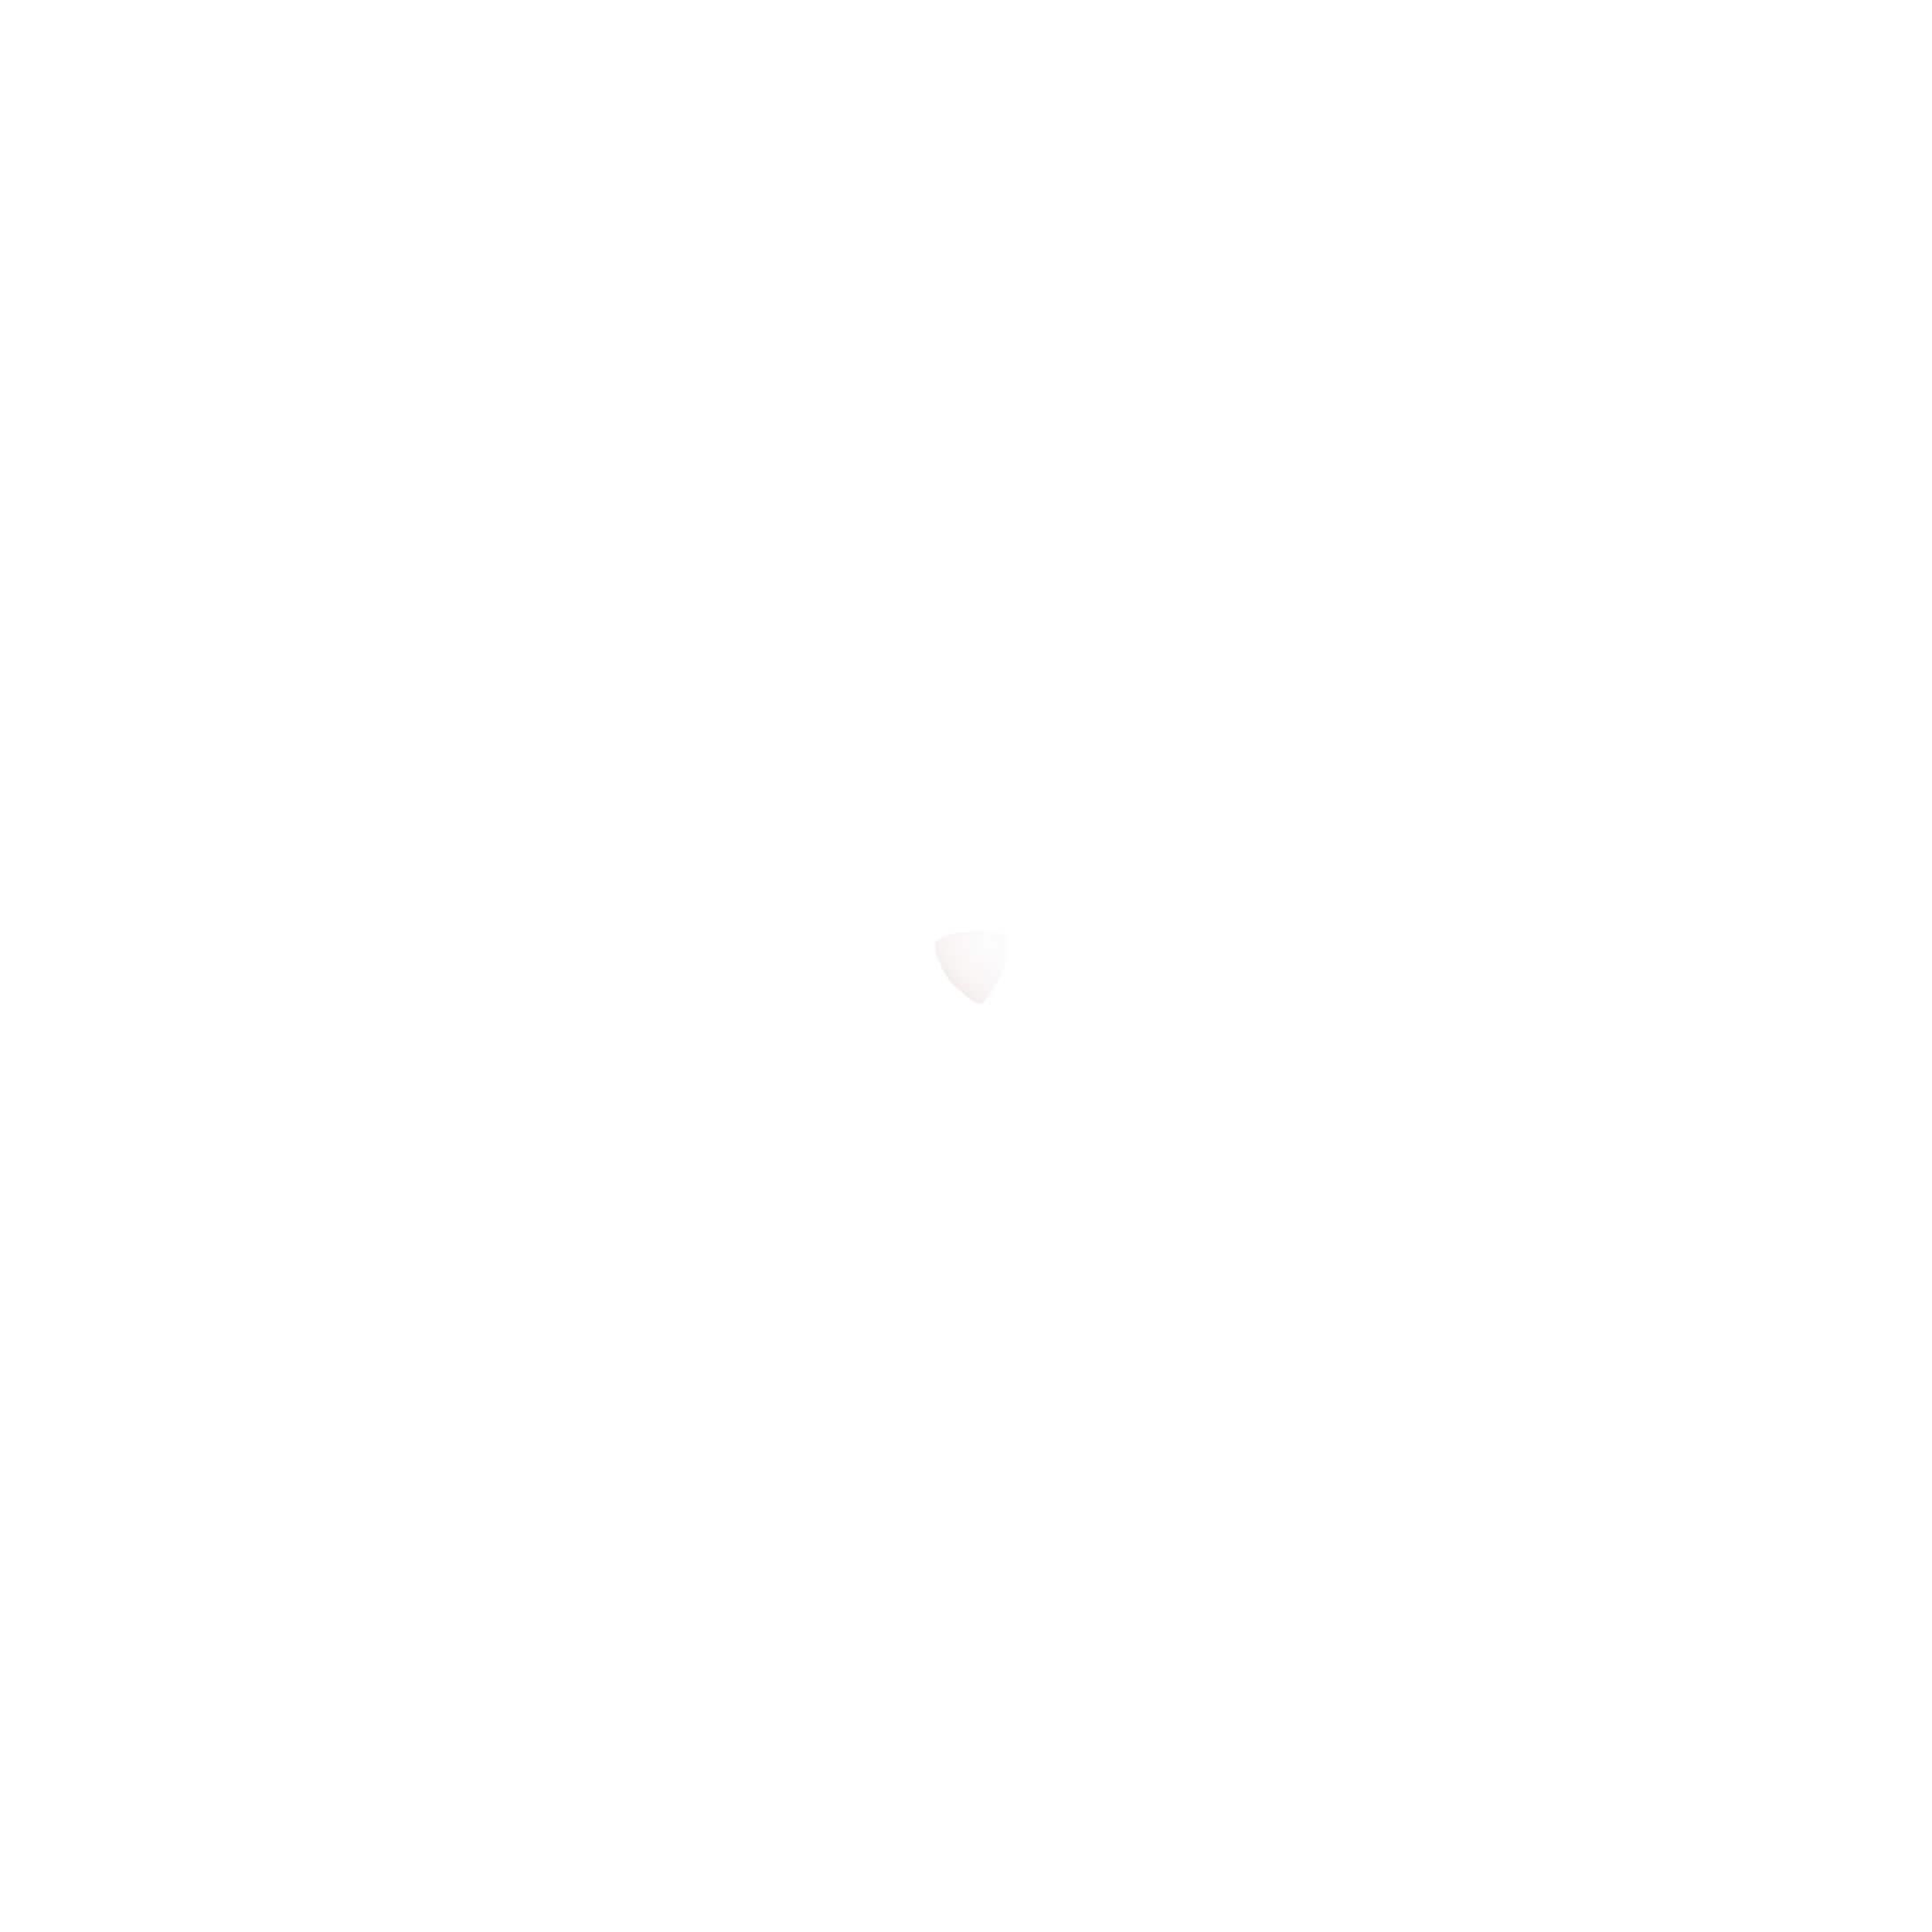 ADEH5003 - ANGULO BULLNOSE TRIM - 1.2 cm X 15 cm